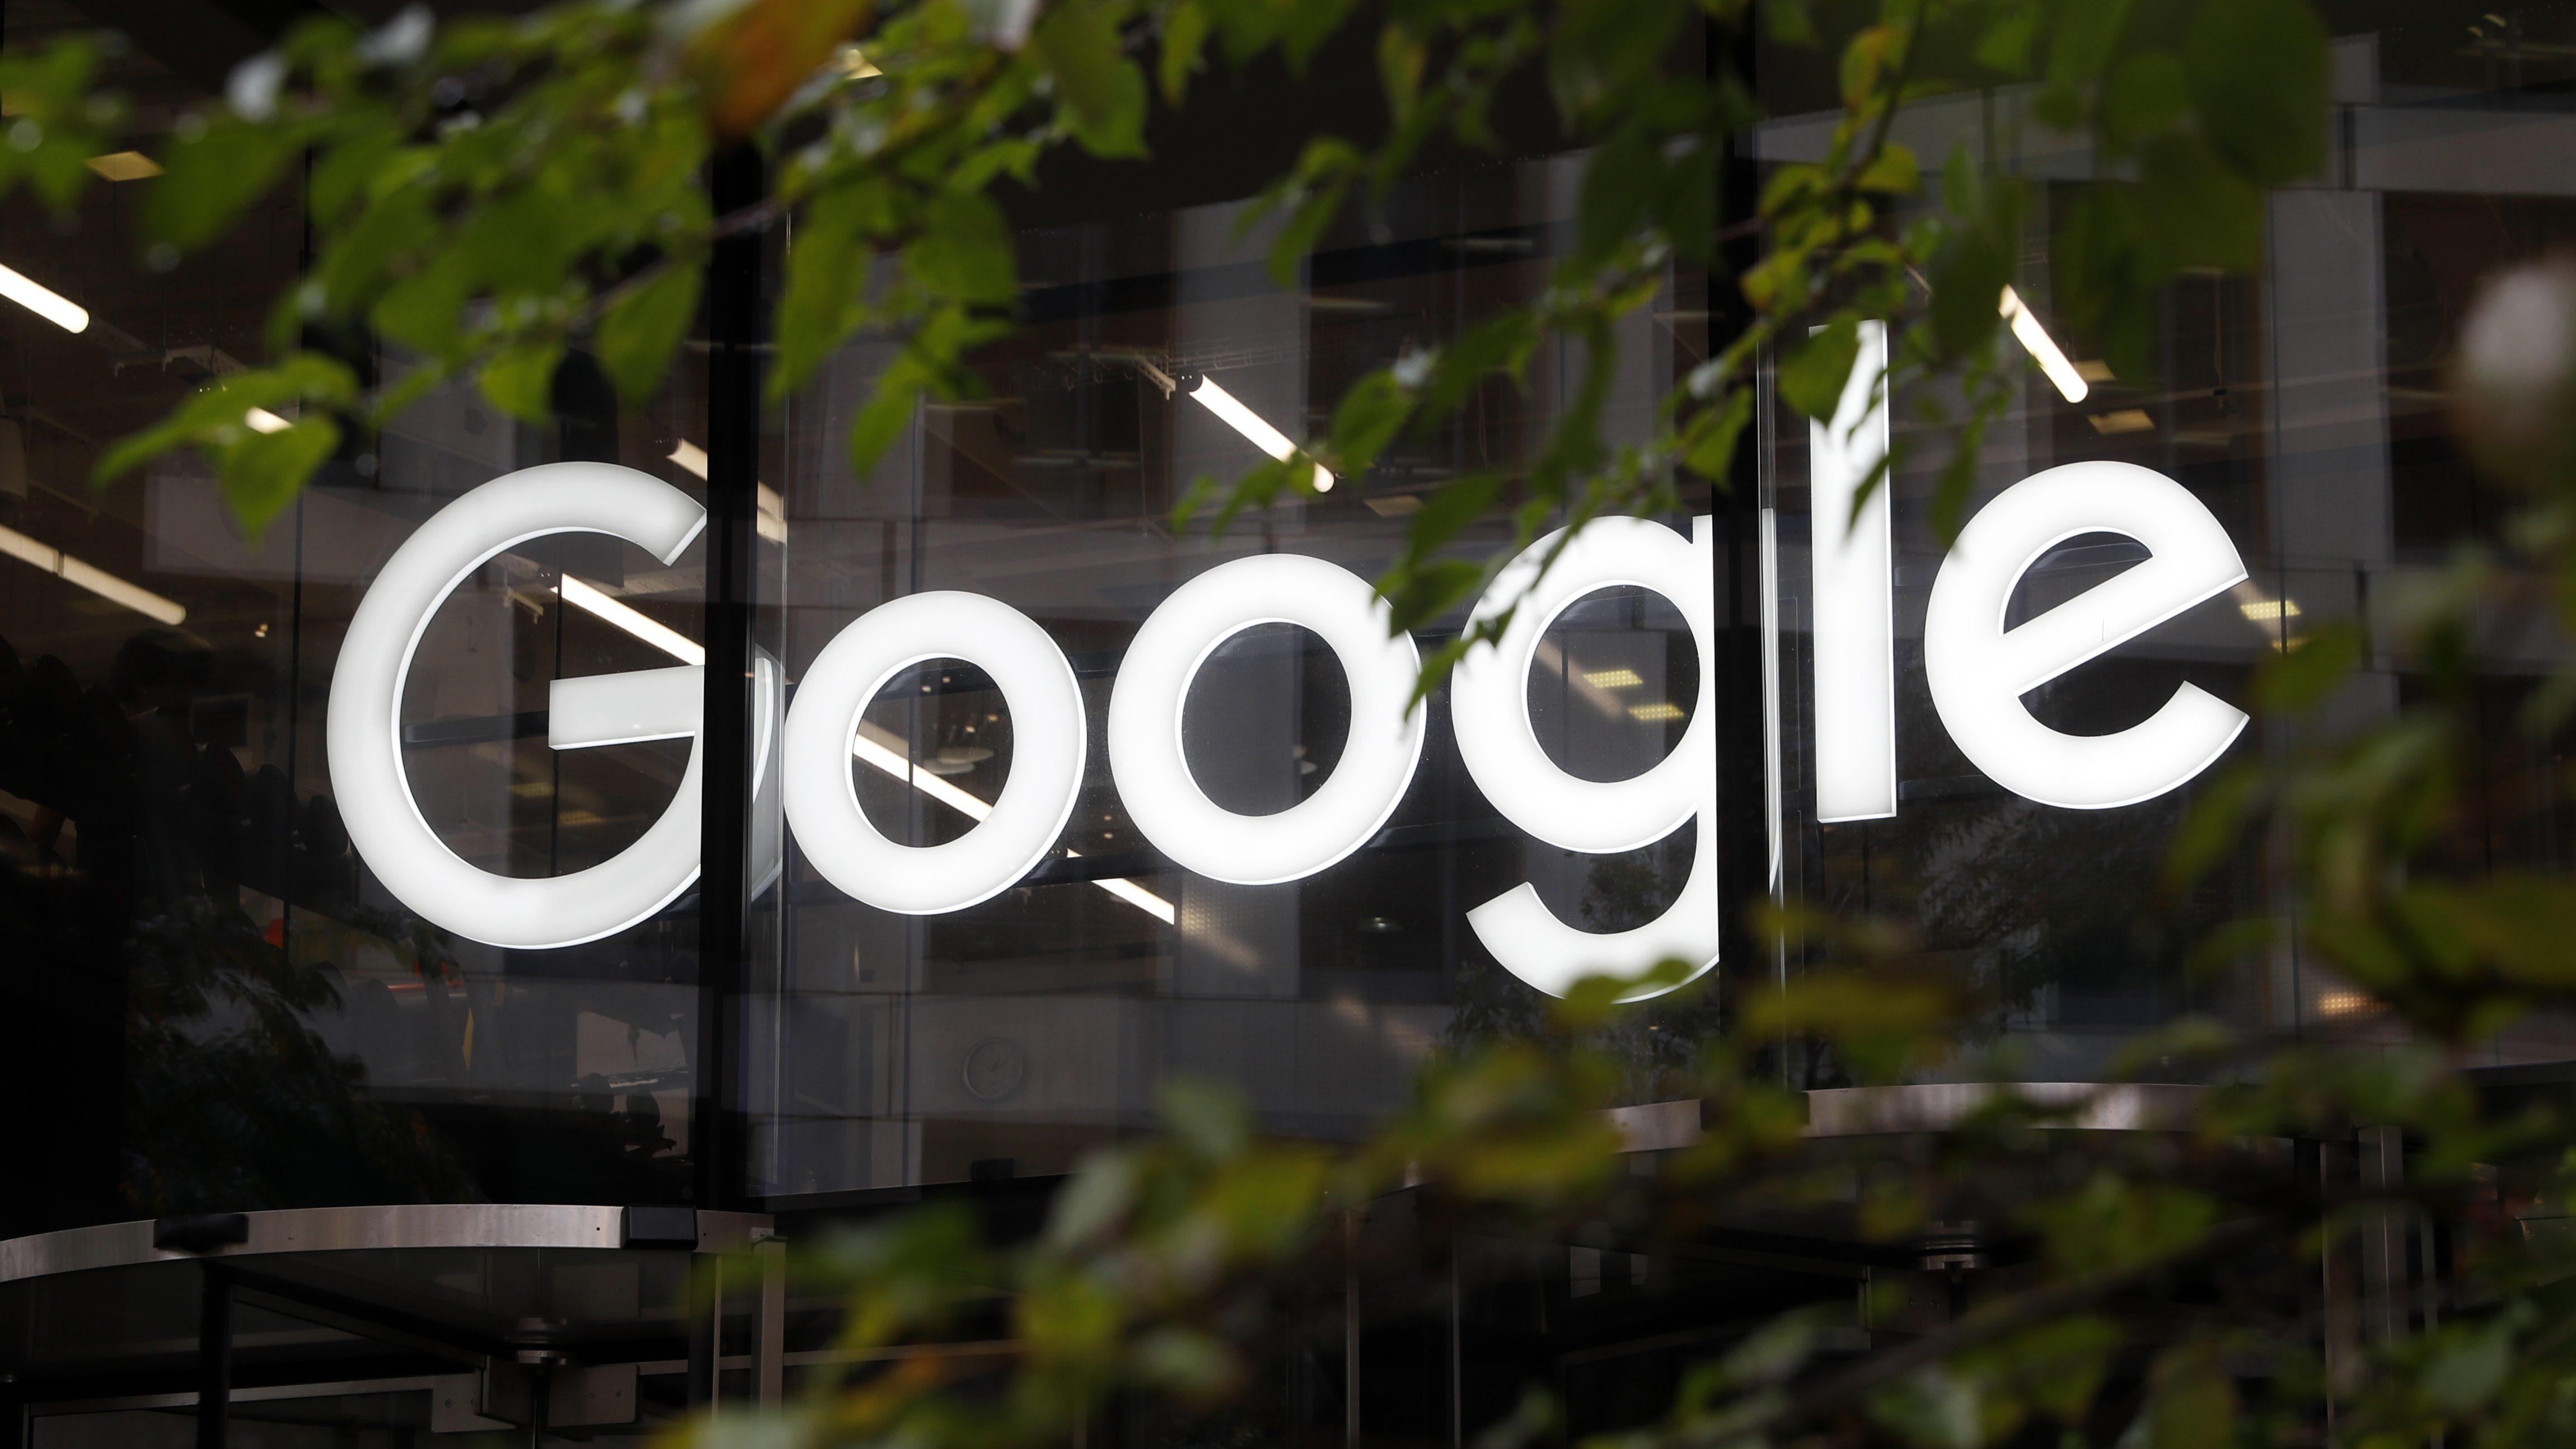 Google's logo on its London office.